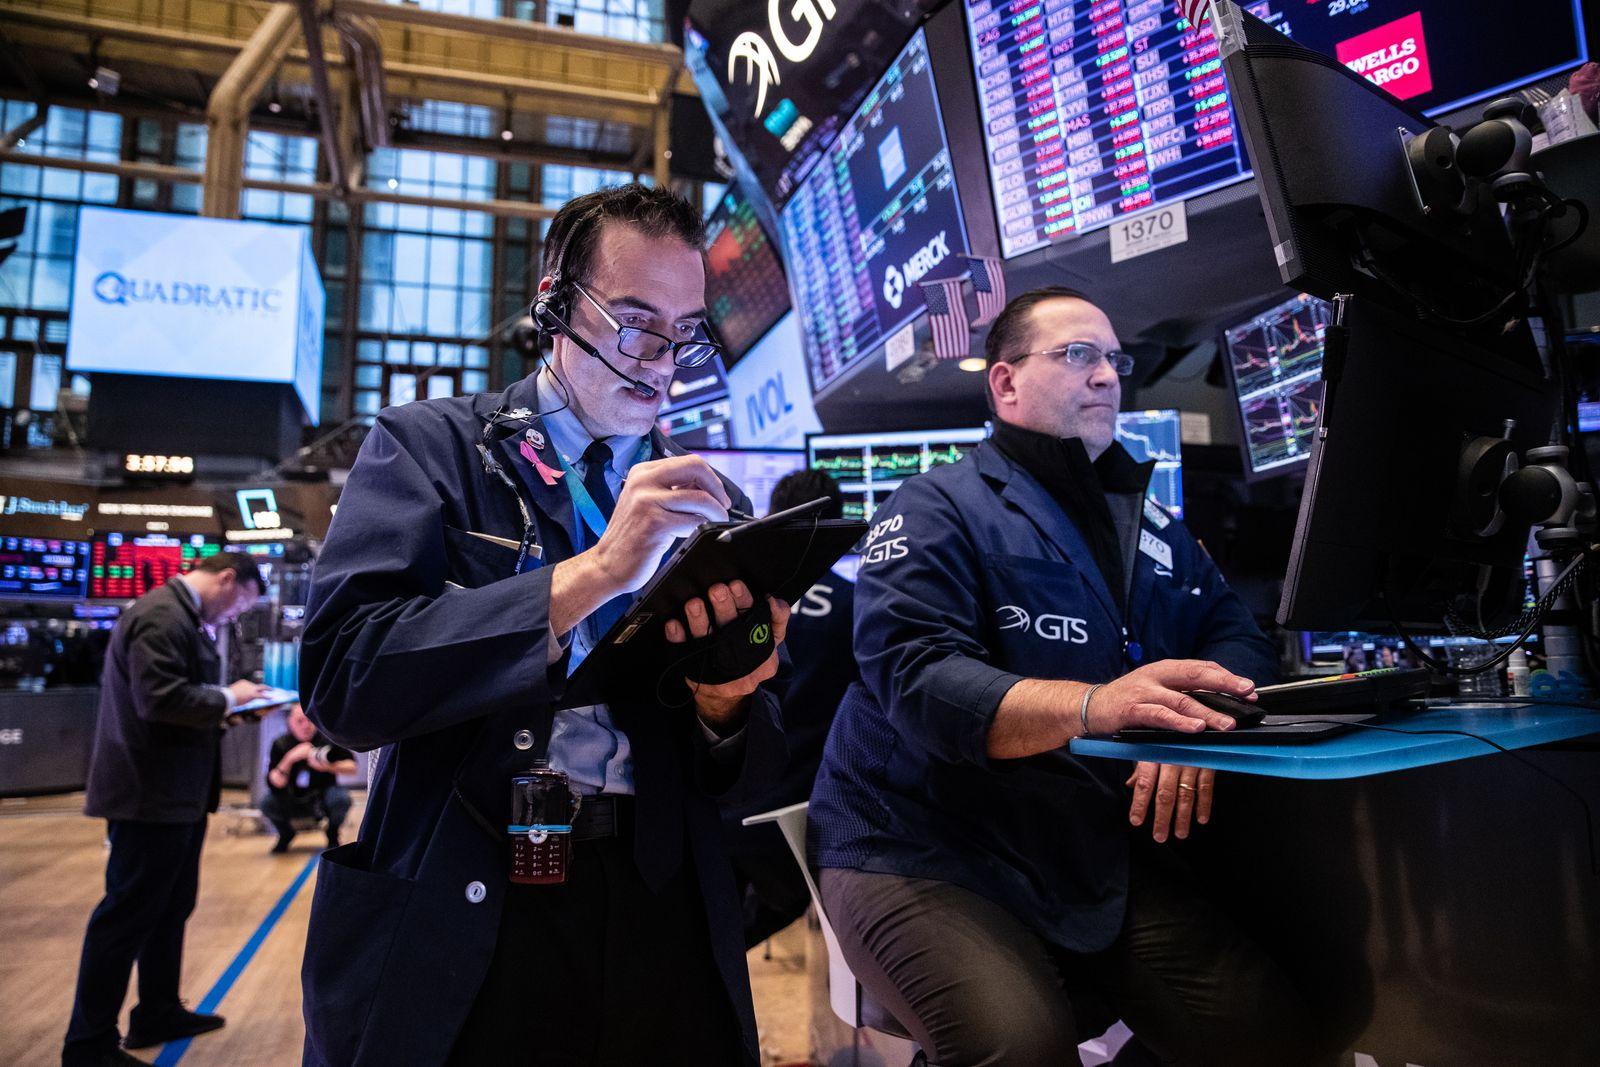 Markets Continue Drastic Downward Slide As Coronavirus Fears Continue